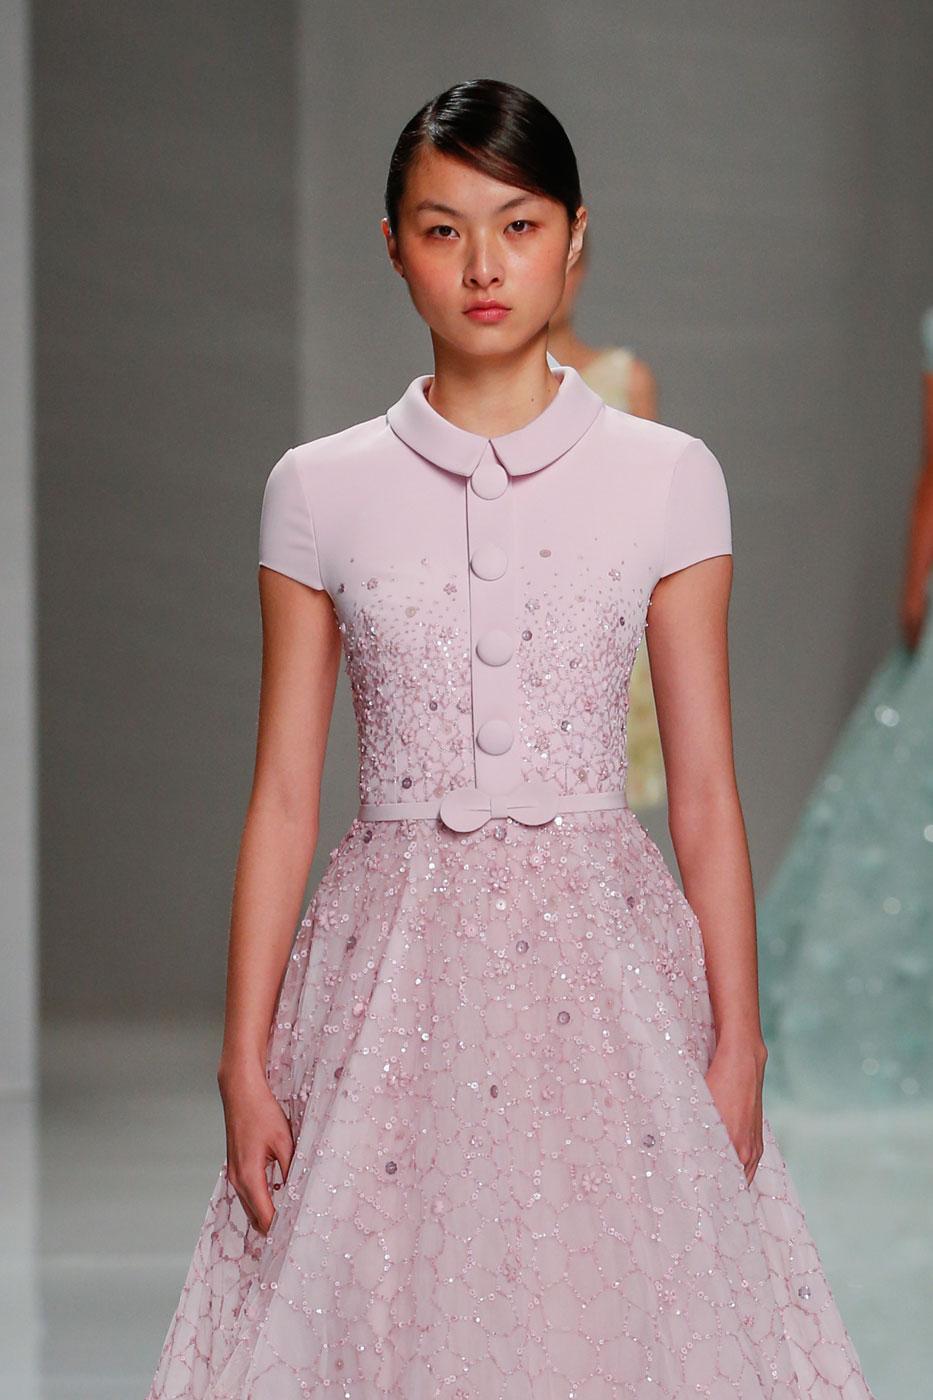 Georges-Hobeika-fashion-runway-show-haute-couture-paris-spring-2015-the-impression-78